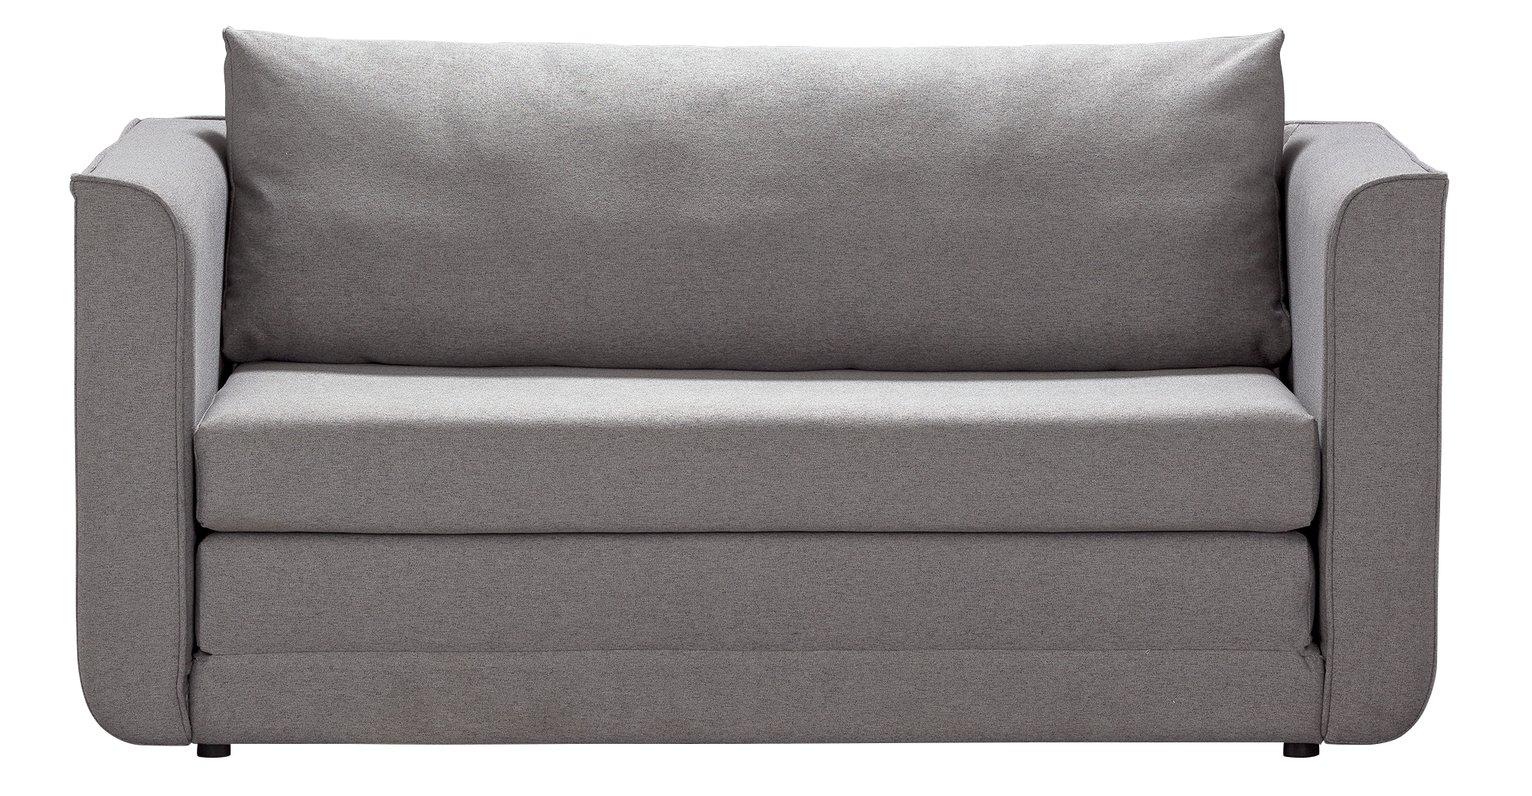 Argos Home Ada 2 Seater Fabric Sofa Bed - Light Grey